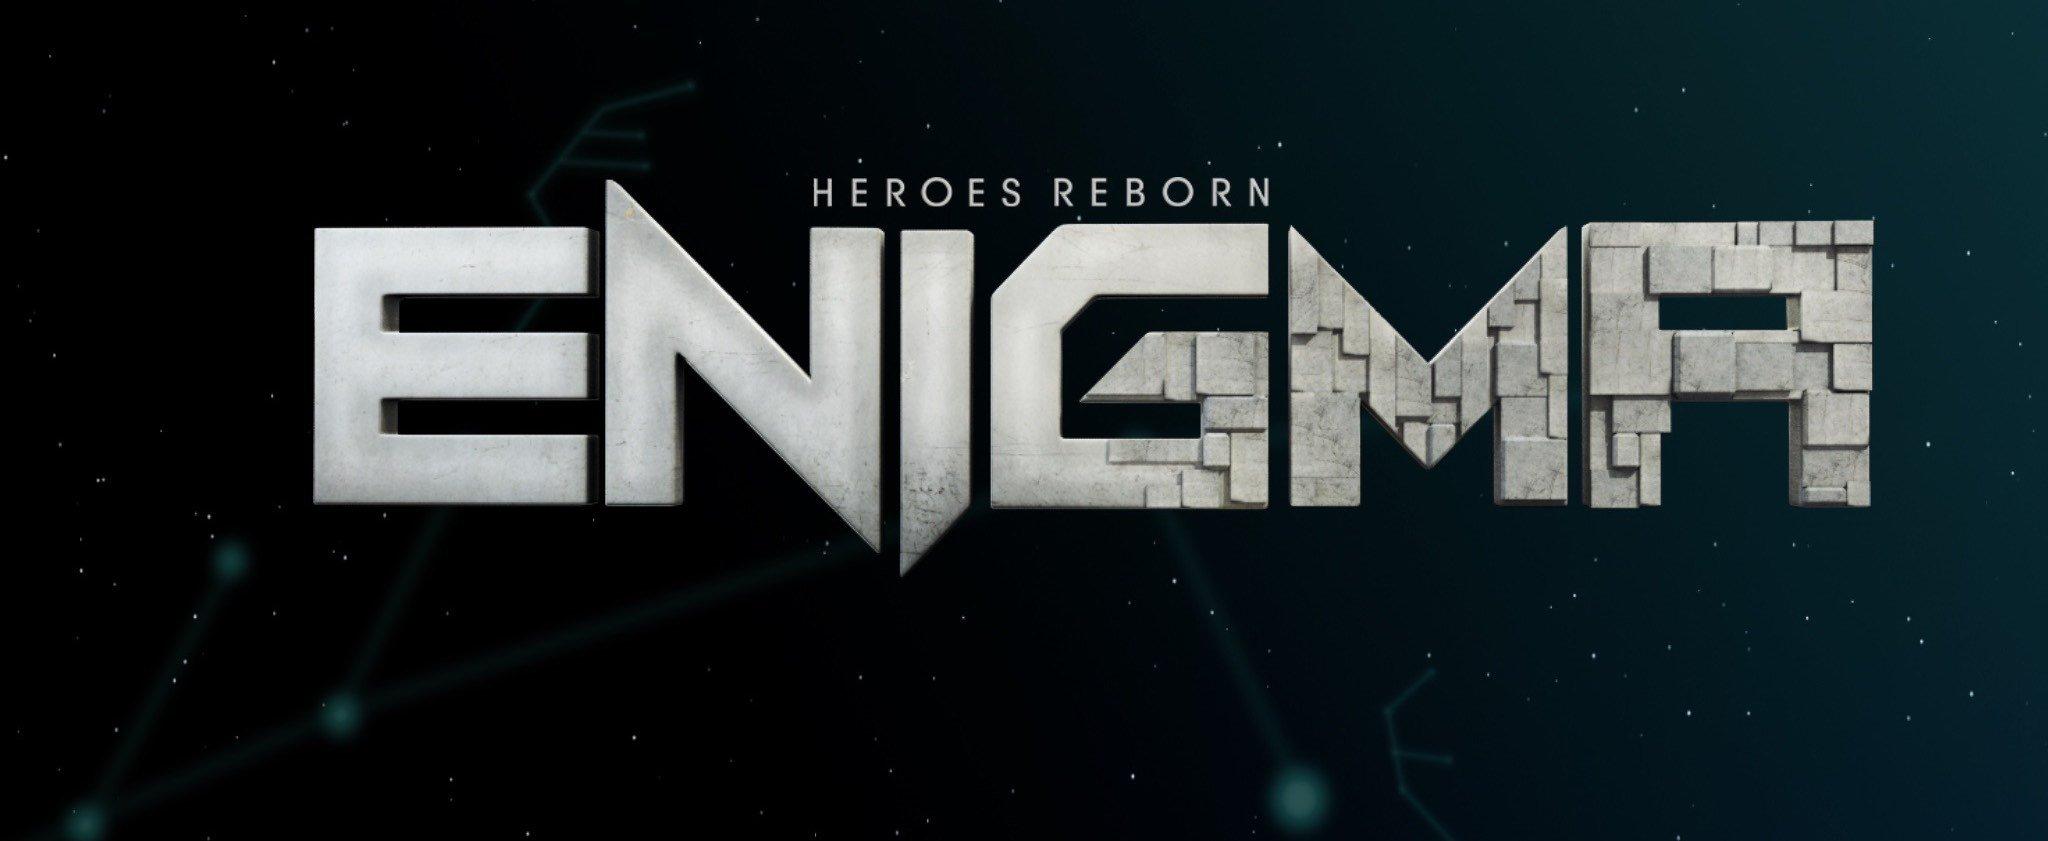 Heroes Reborn: Enigma. Спастись из лаборатории